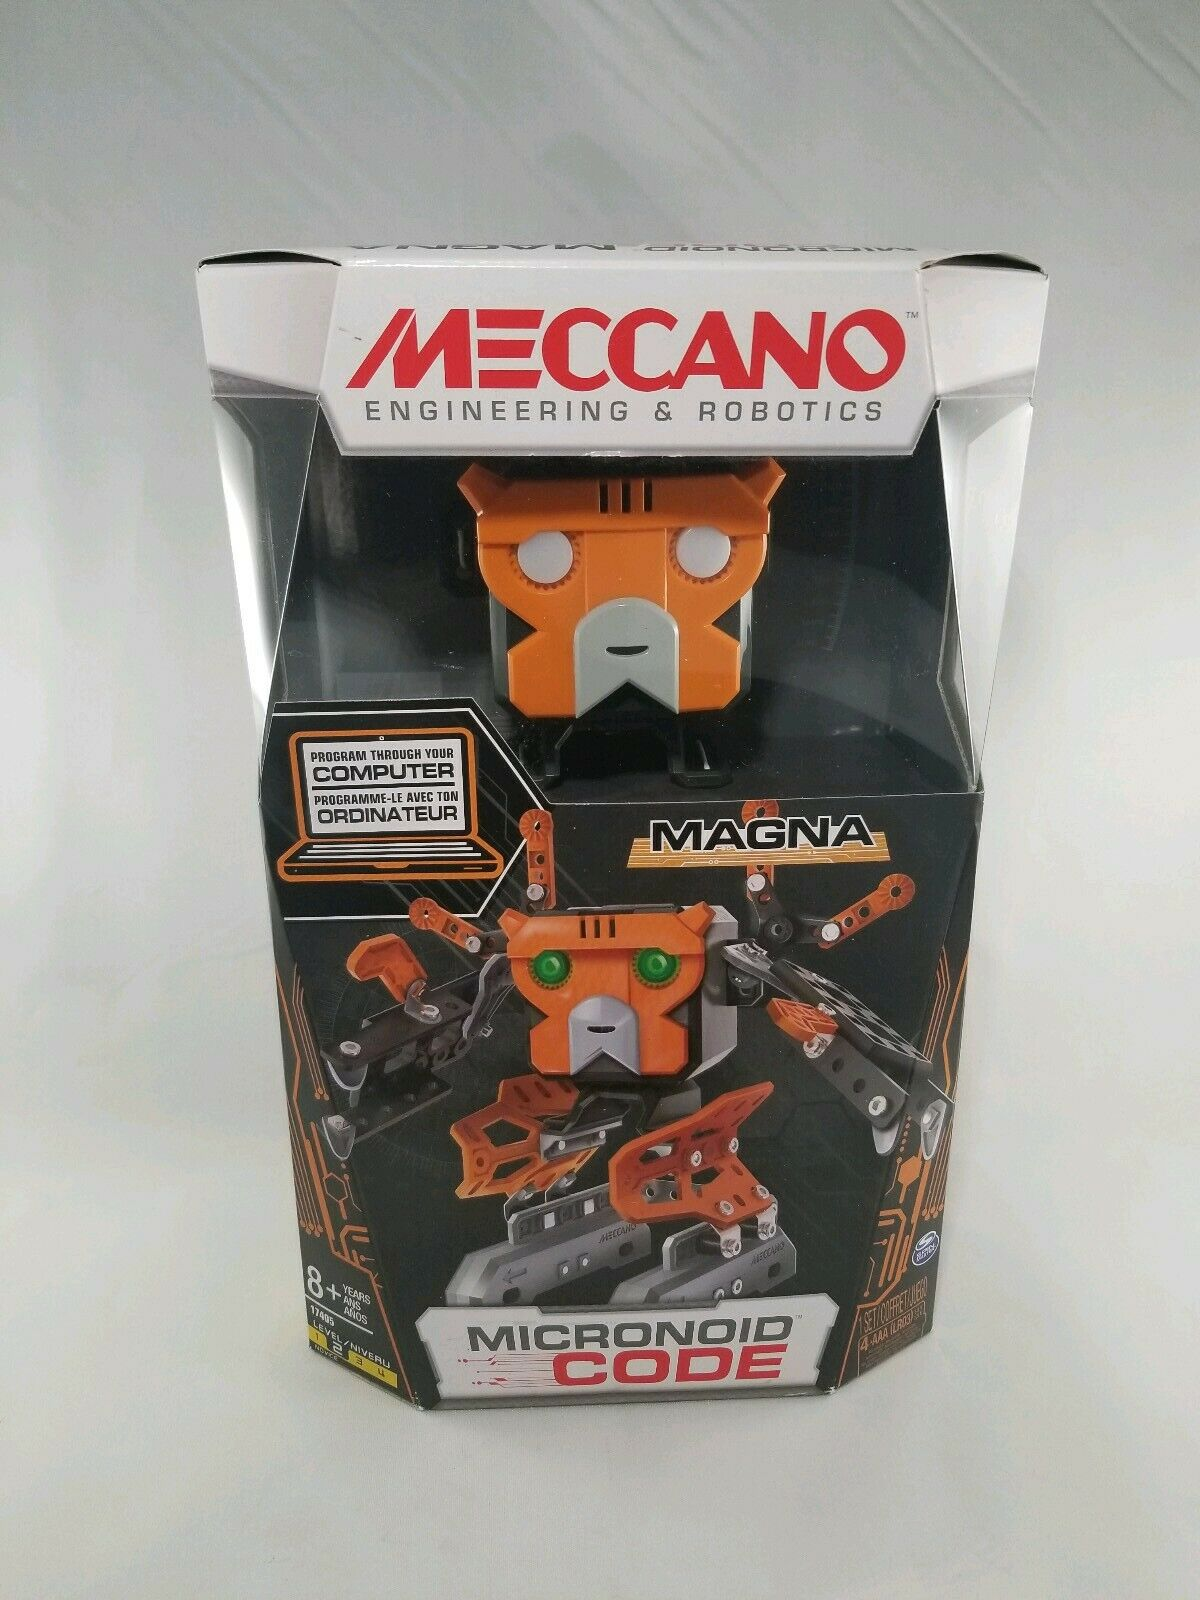 Meccano-Erector - Micronoid Code Magna Programmable Robot Building Kit Kit Kit   NIB c611d4